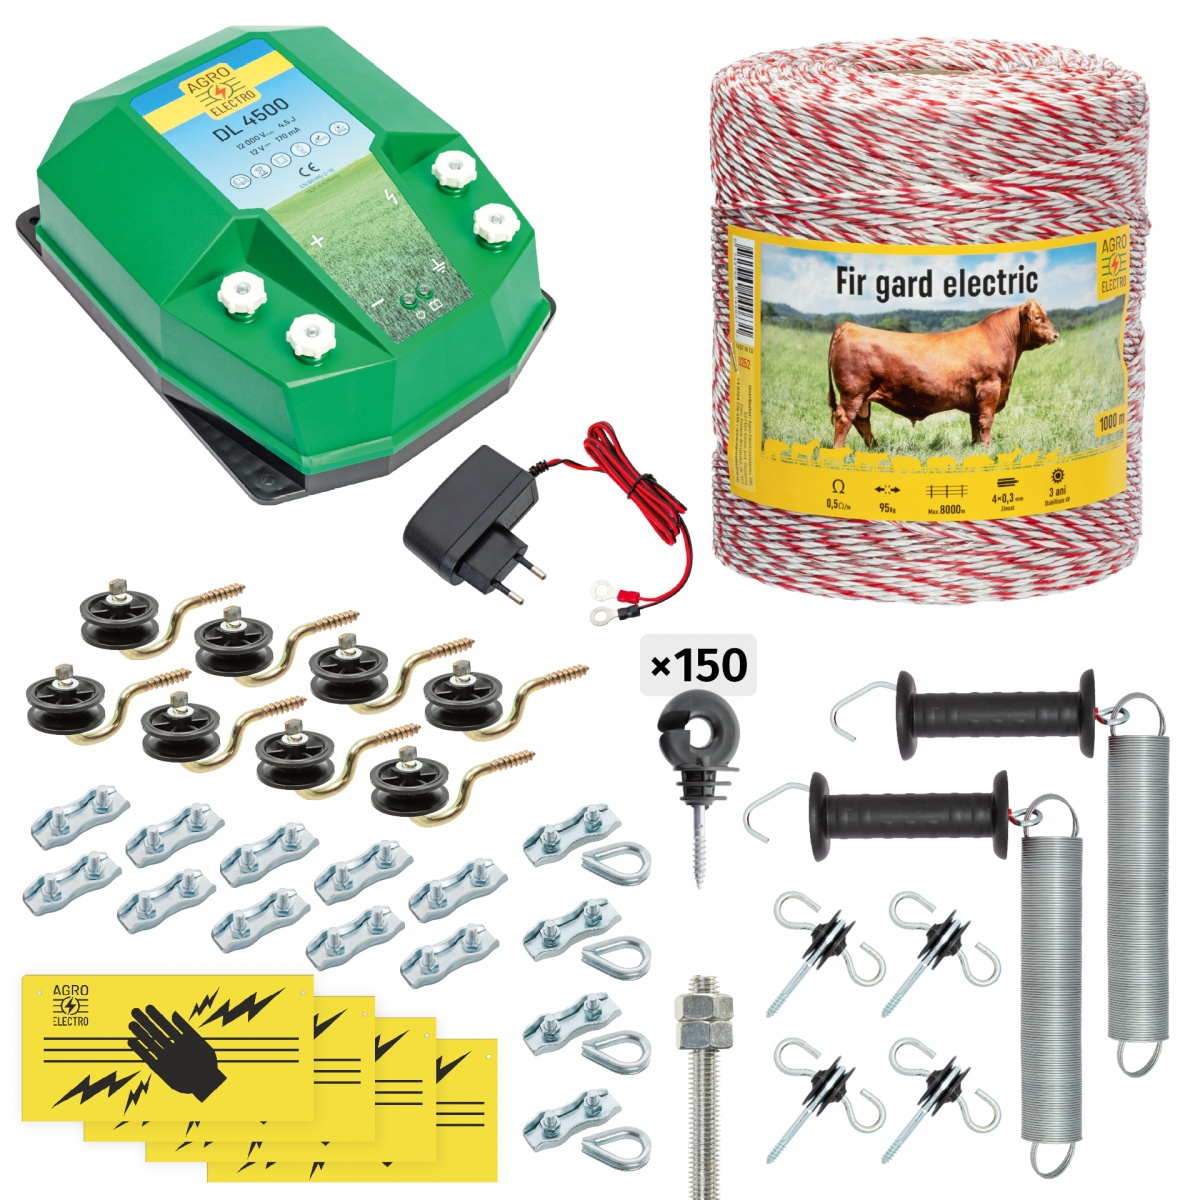 Pachet gard electric complet 1000m, 4,5 Joule, 230V, pentru animale domestice